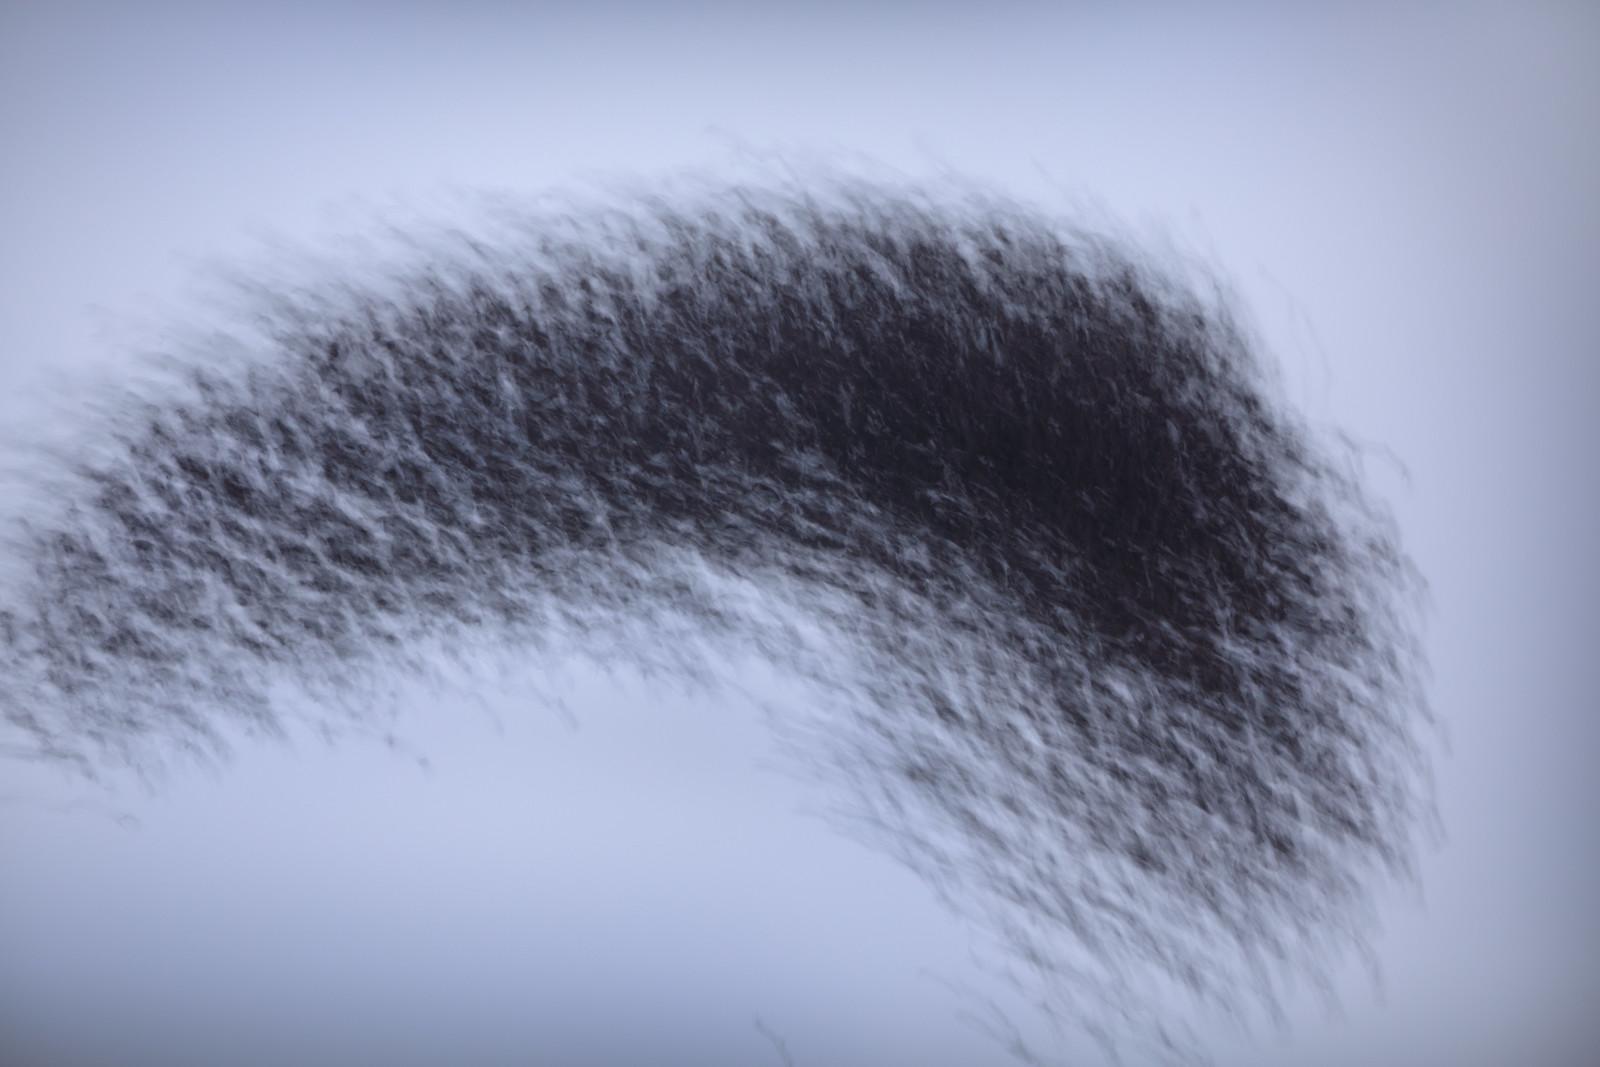 Starling Murmuration - Motion Blur